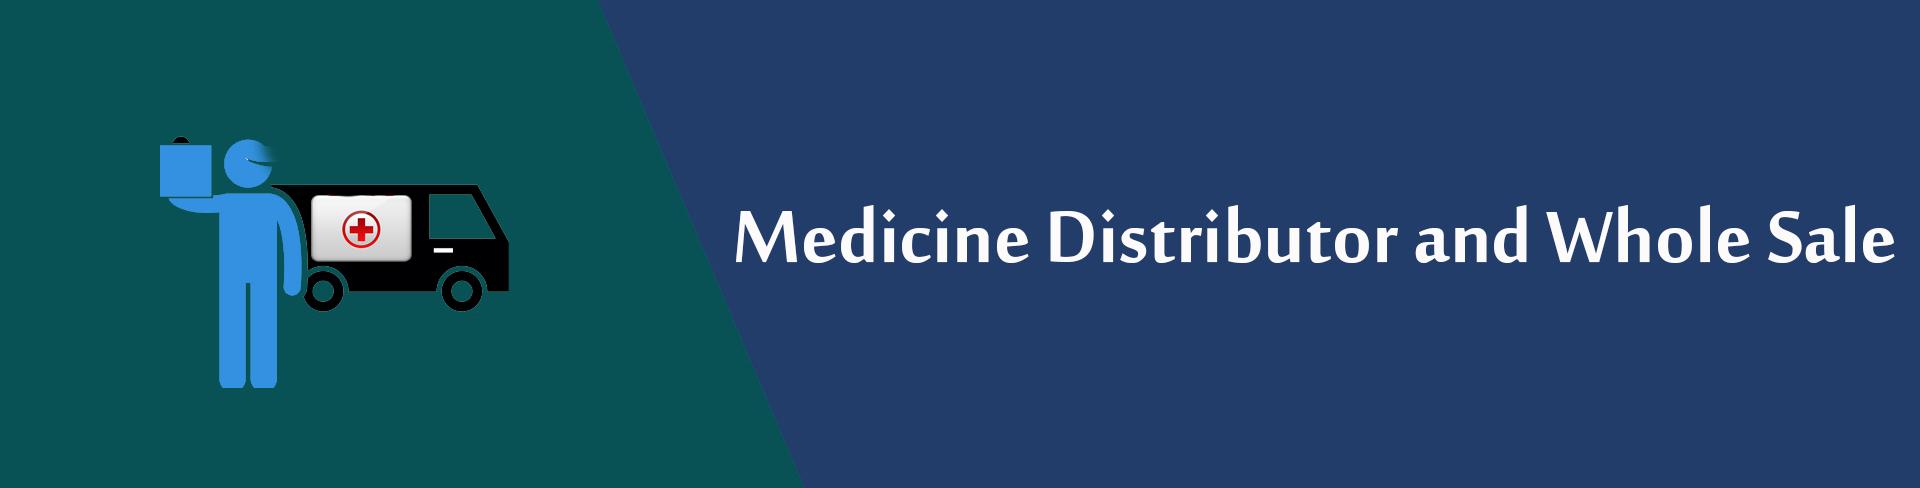 Medicine Distributor and Whole Sale Software